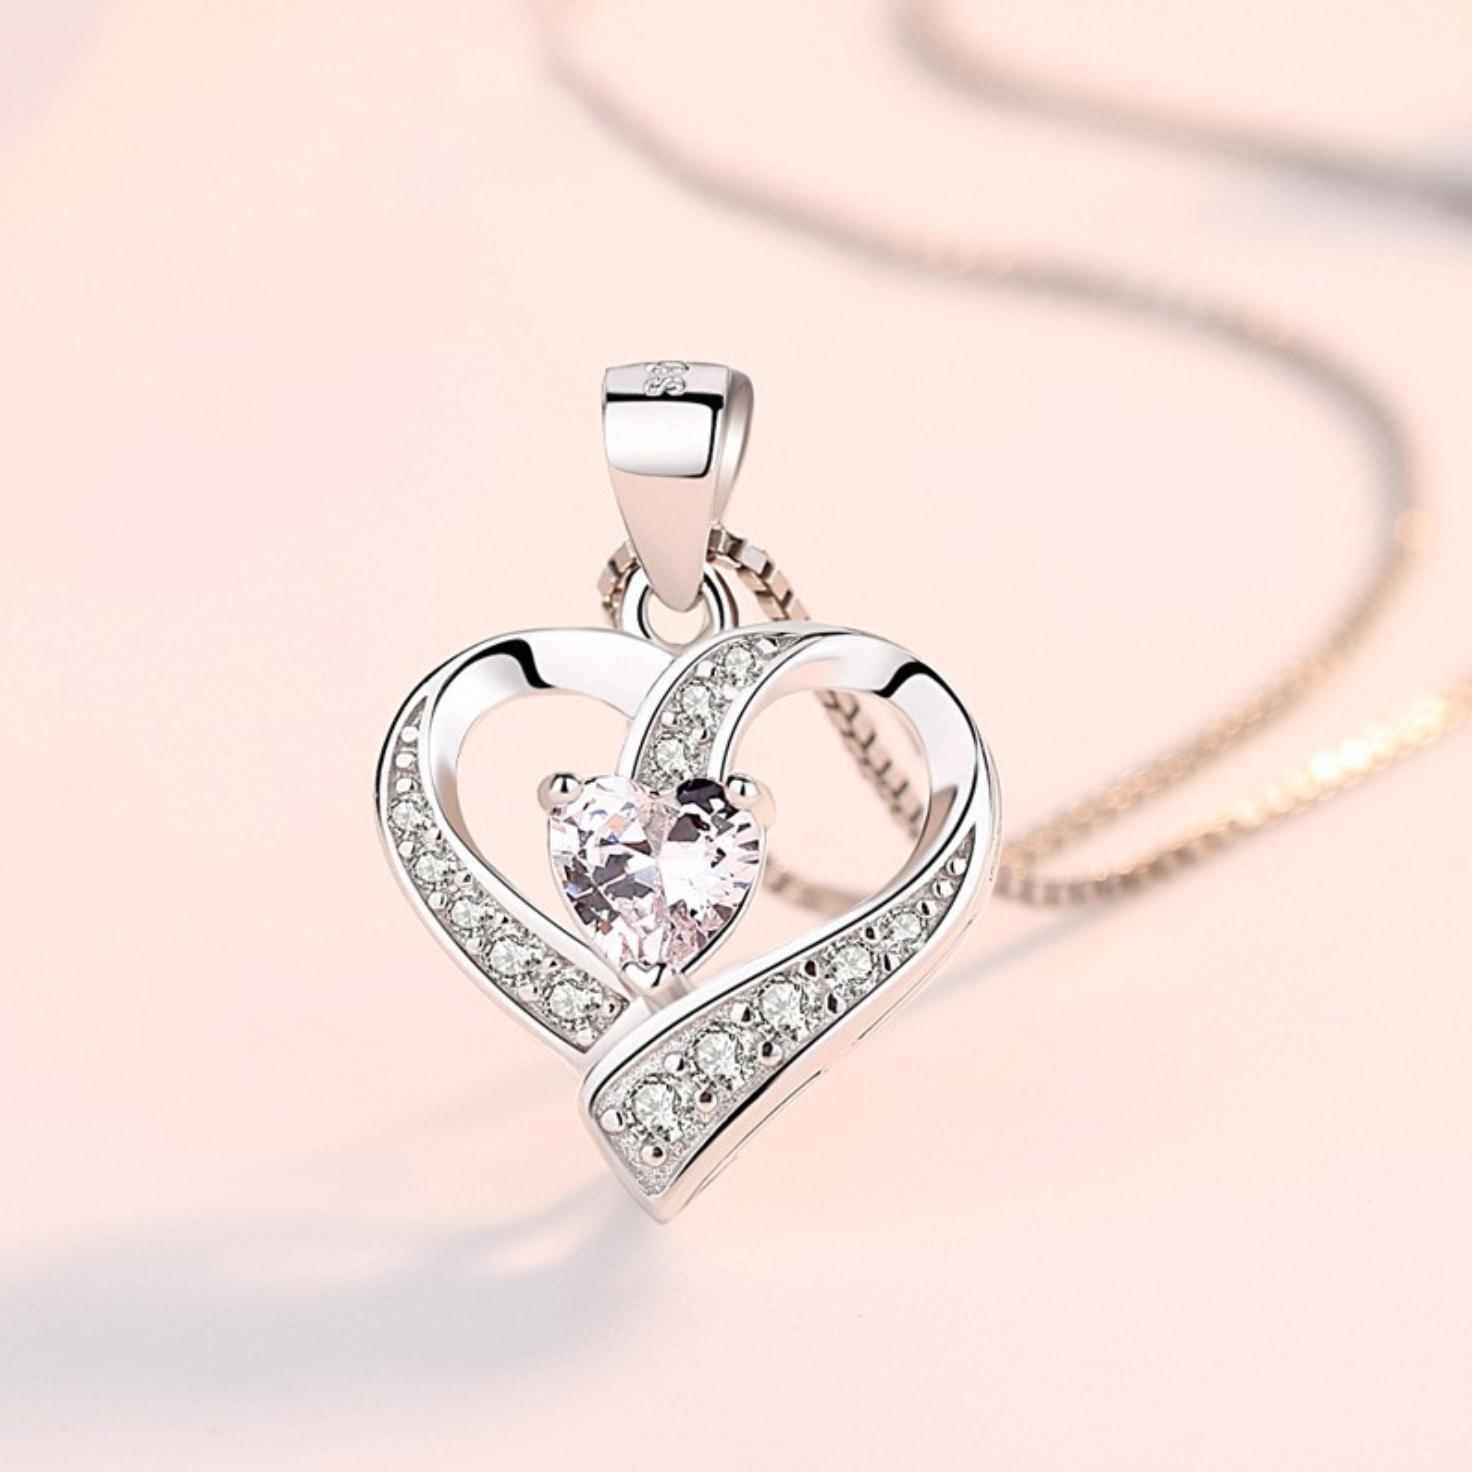 Jewellery - Heart Swirl Stone 925 Sterling Silver Pendant Chain Necklace Womens Jewellery